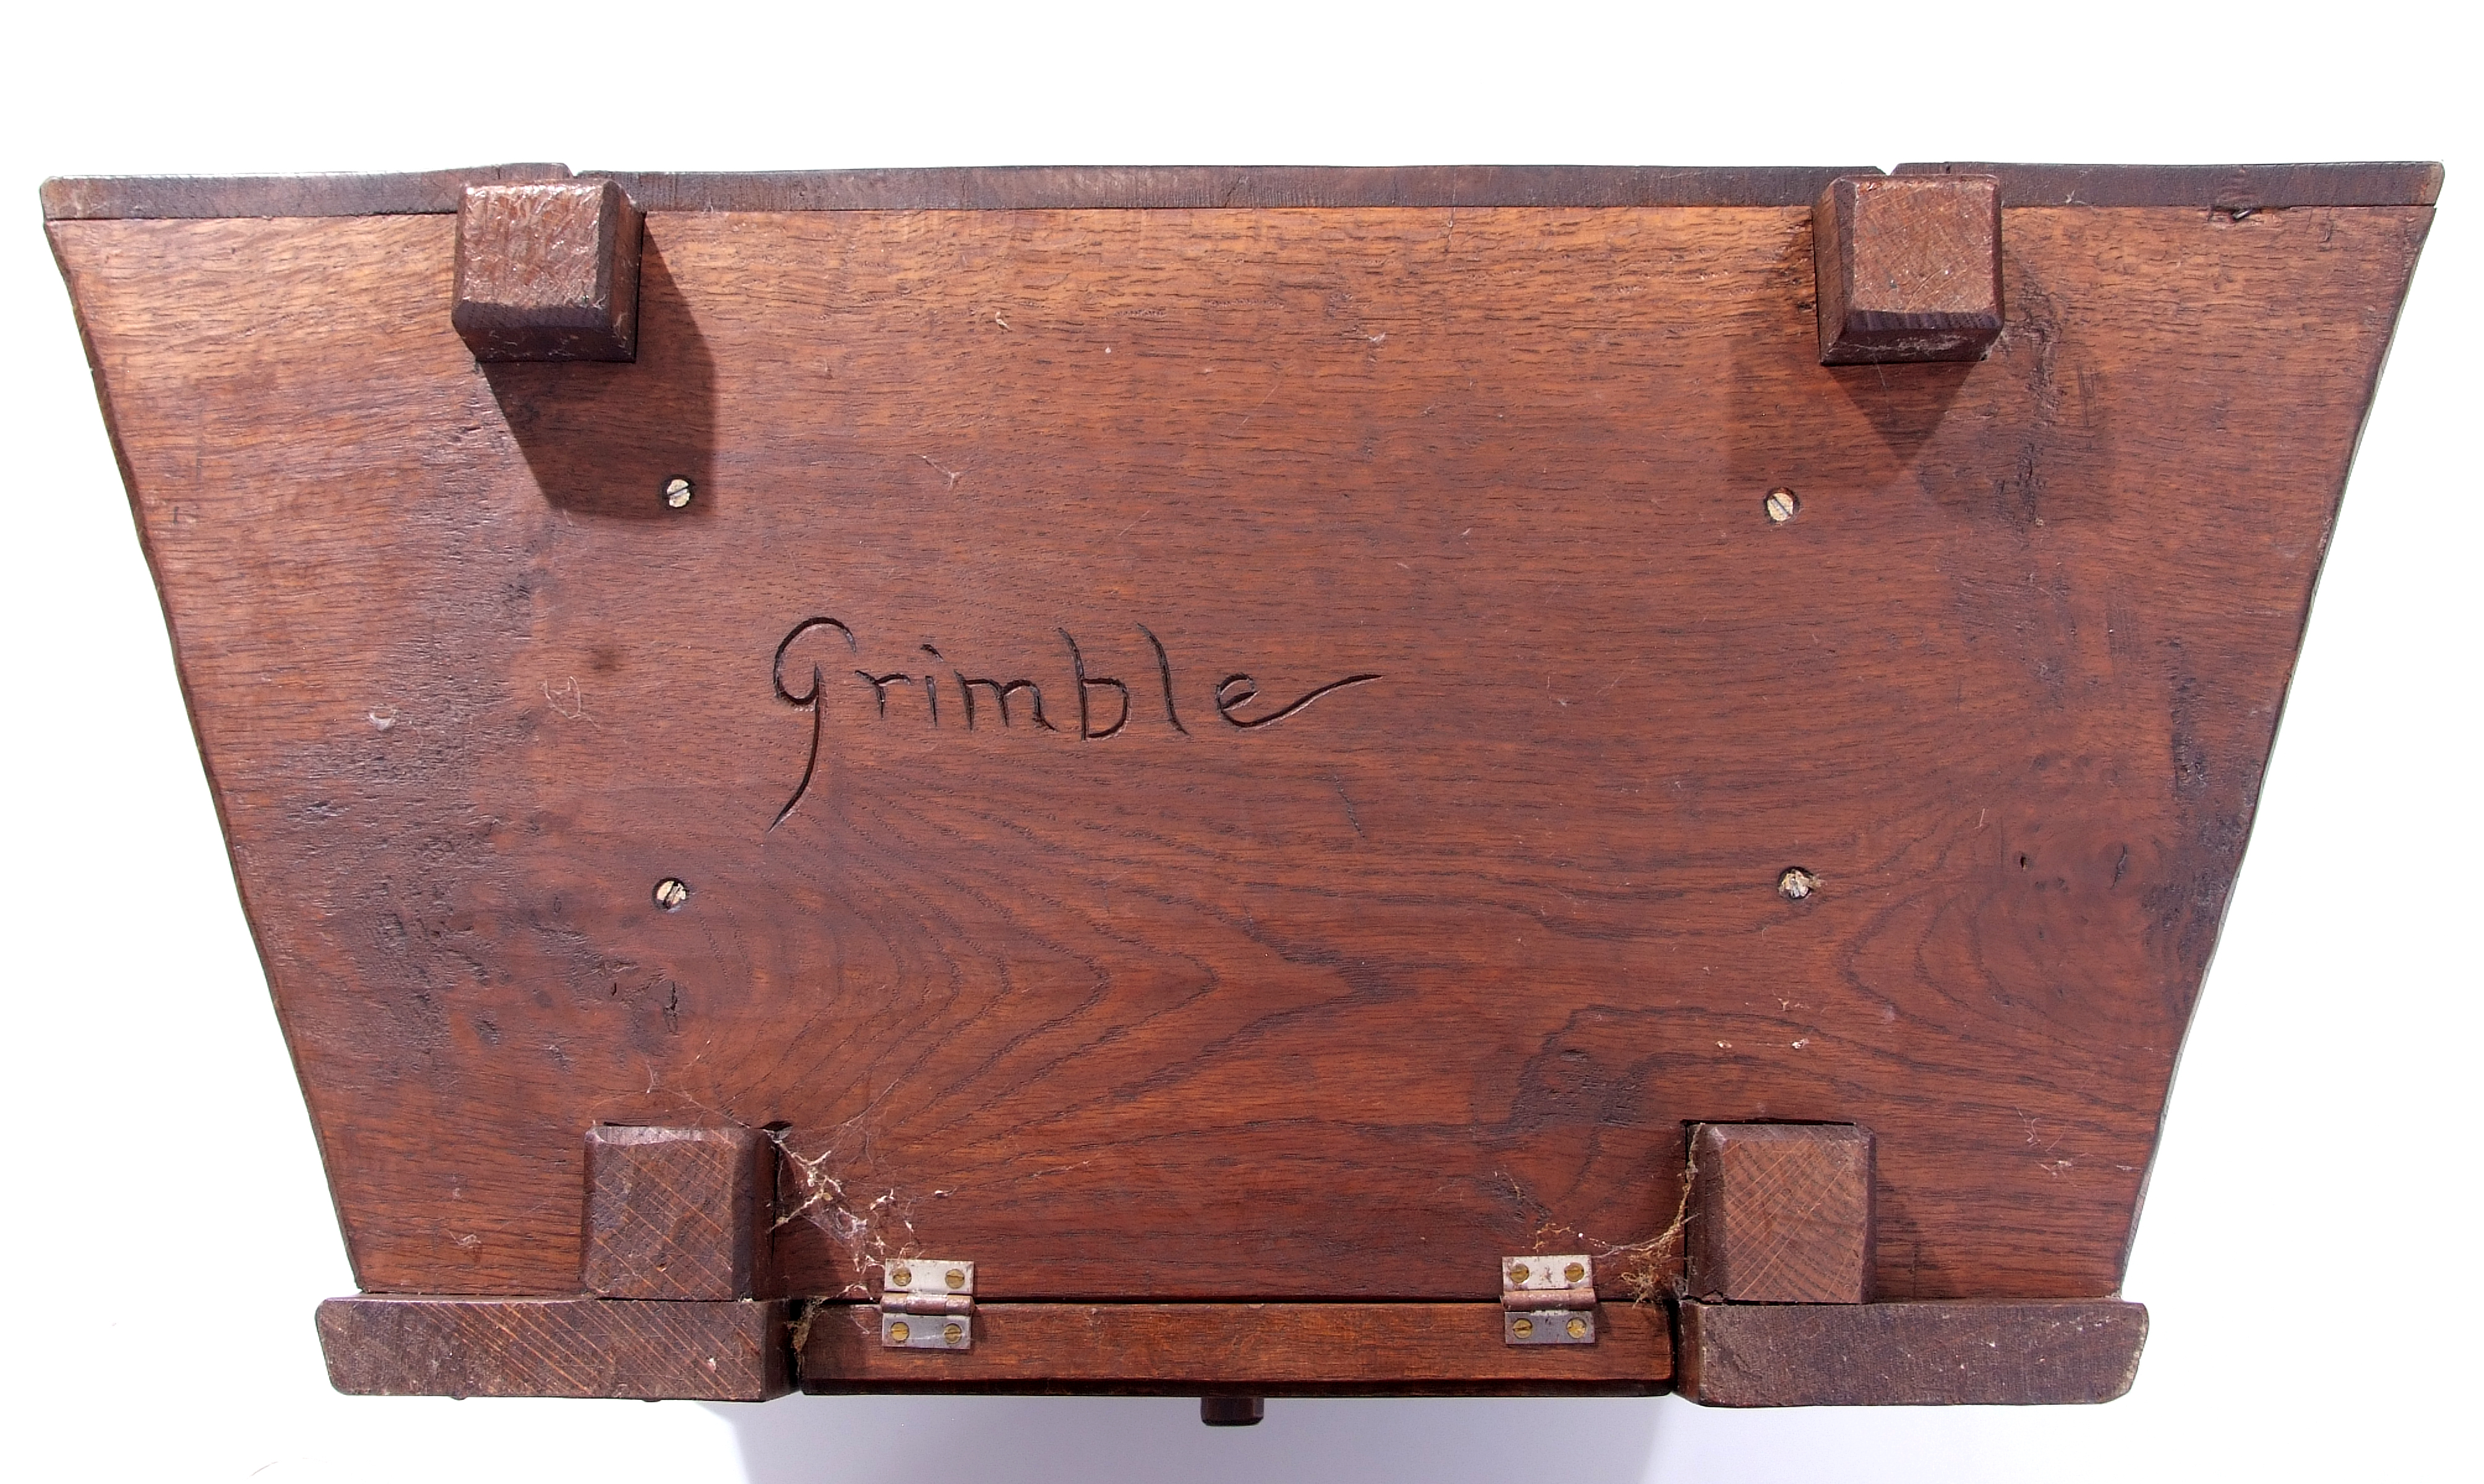 Jack Grimble of Cromer, a small oak losenge shaped side table with carved Tudor Rose detail 76cm - Image 3 of 10